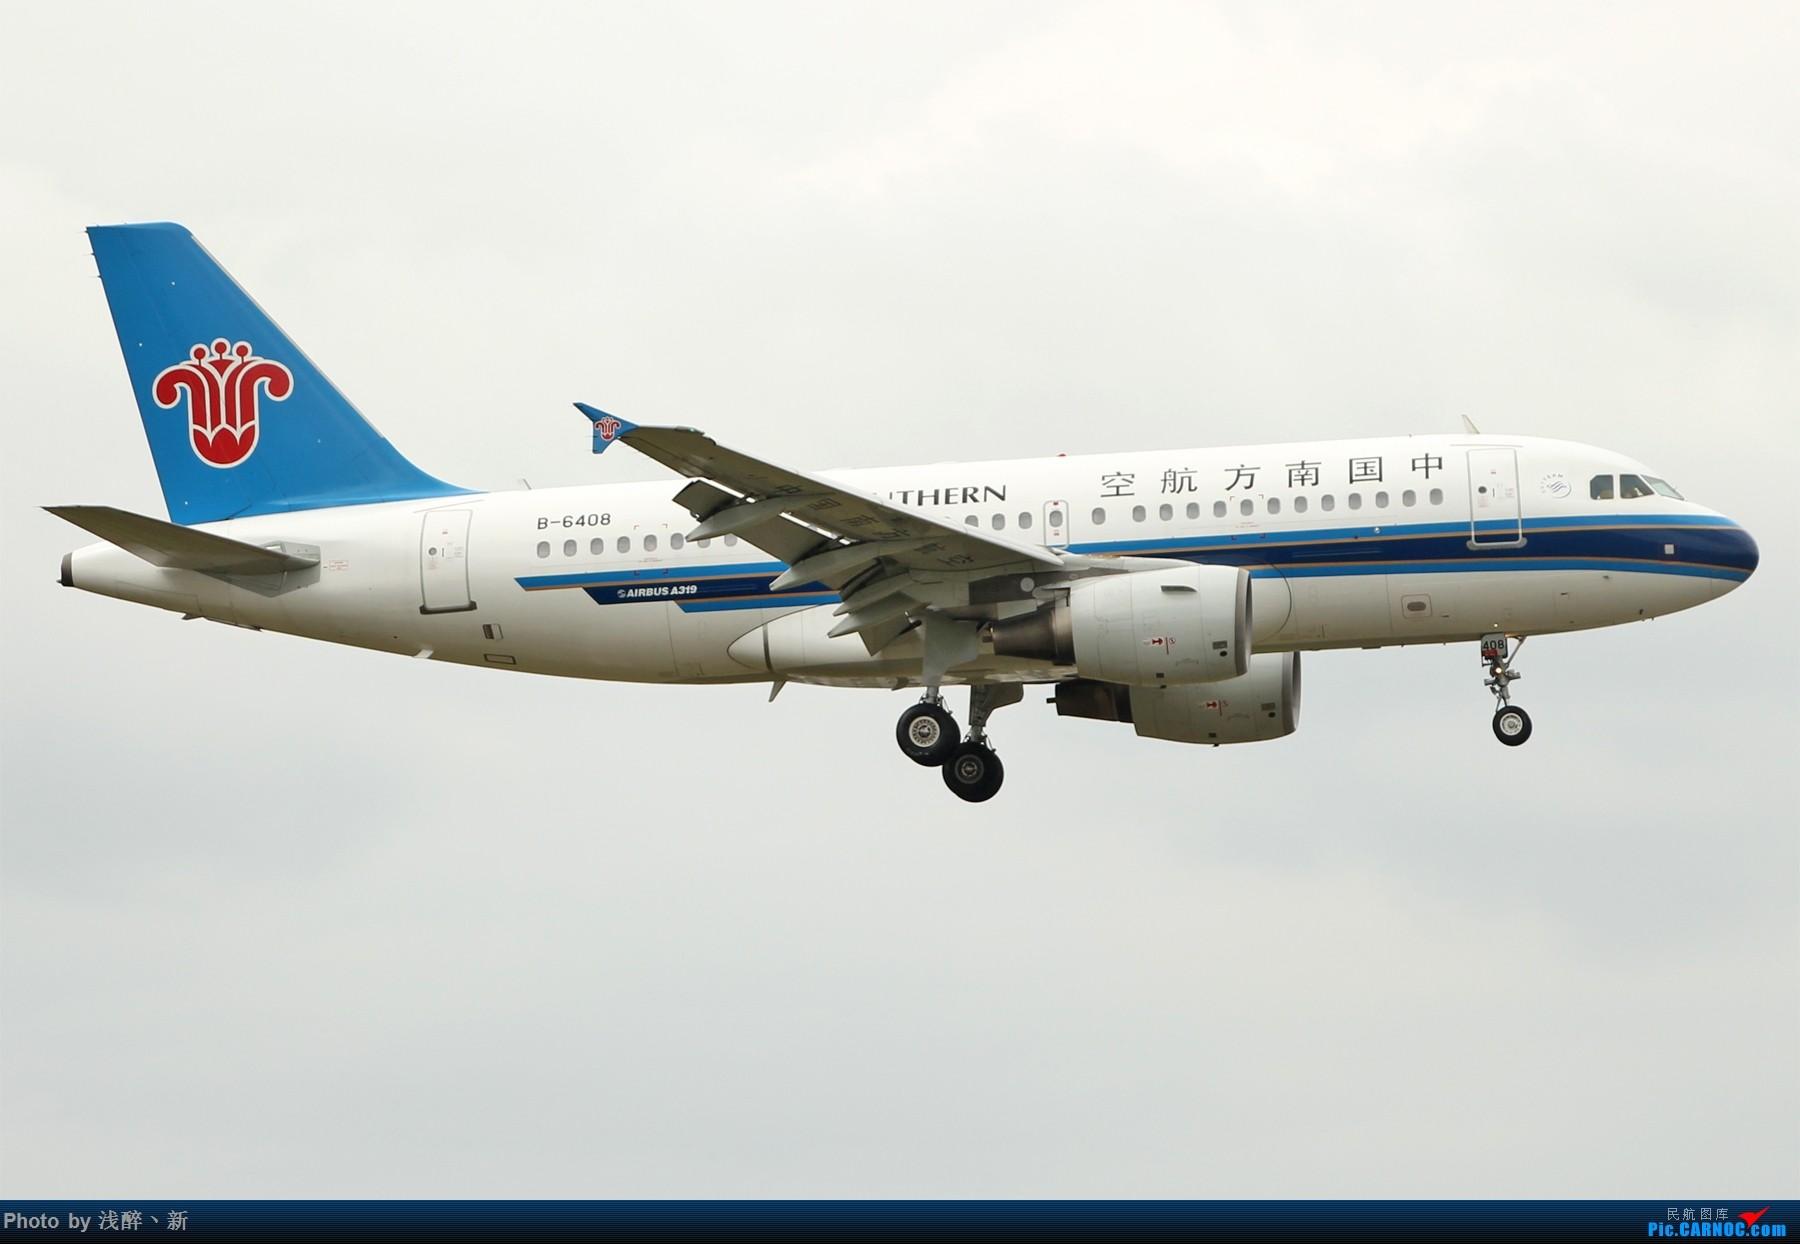 Re:[原创]DLC 7.16 机场游击战 AIRBUS A319-100 B-6408 中国大连国际机场